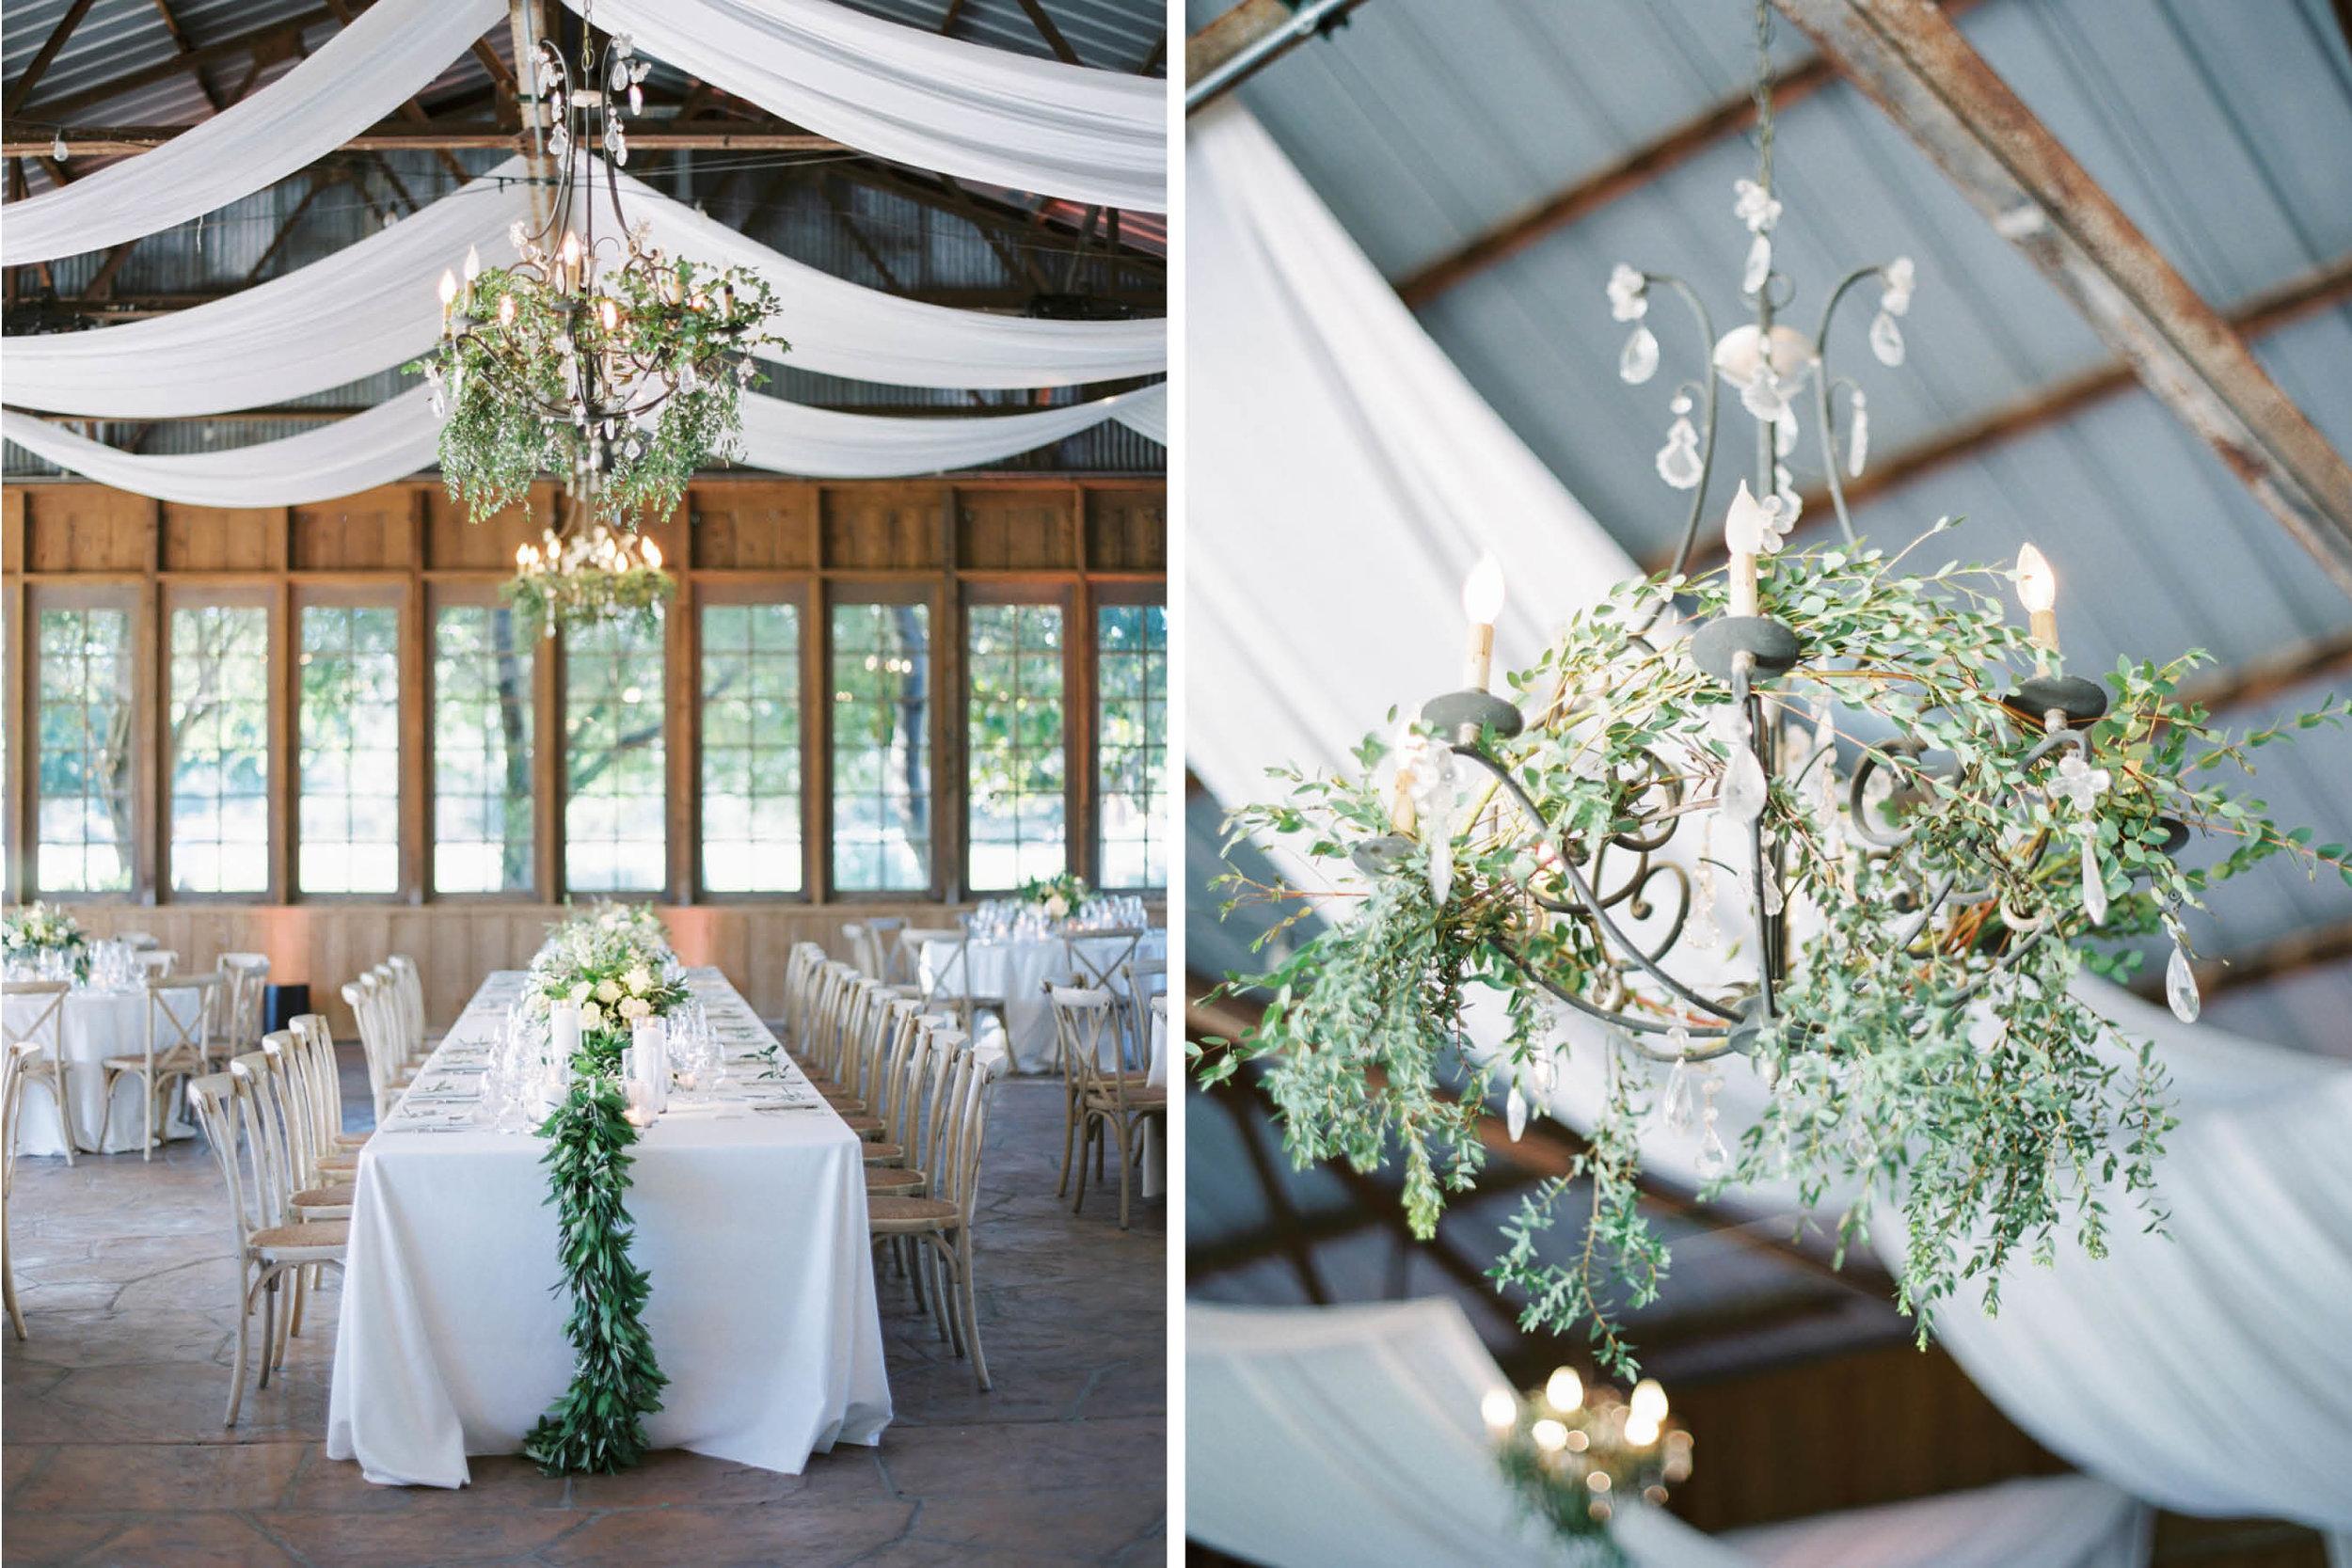 alegria-by-design-wedding-planner-planning-event-design-coordinator-day-of-month-crossroads-estate-garden-vineyard-firestone-barn-location-rustic-santa-barbara (1 (16).jpg